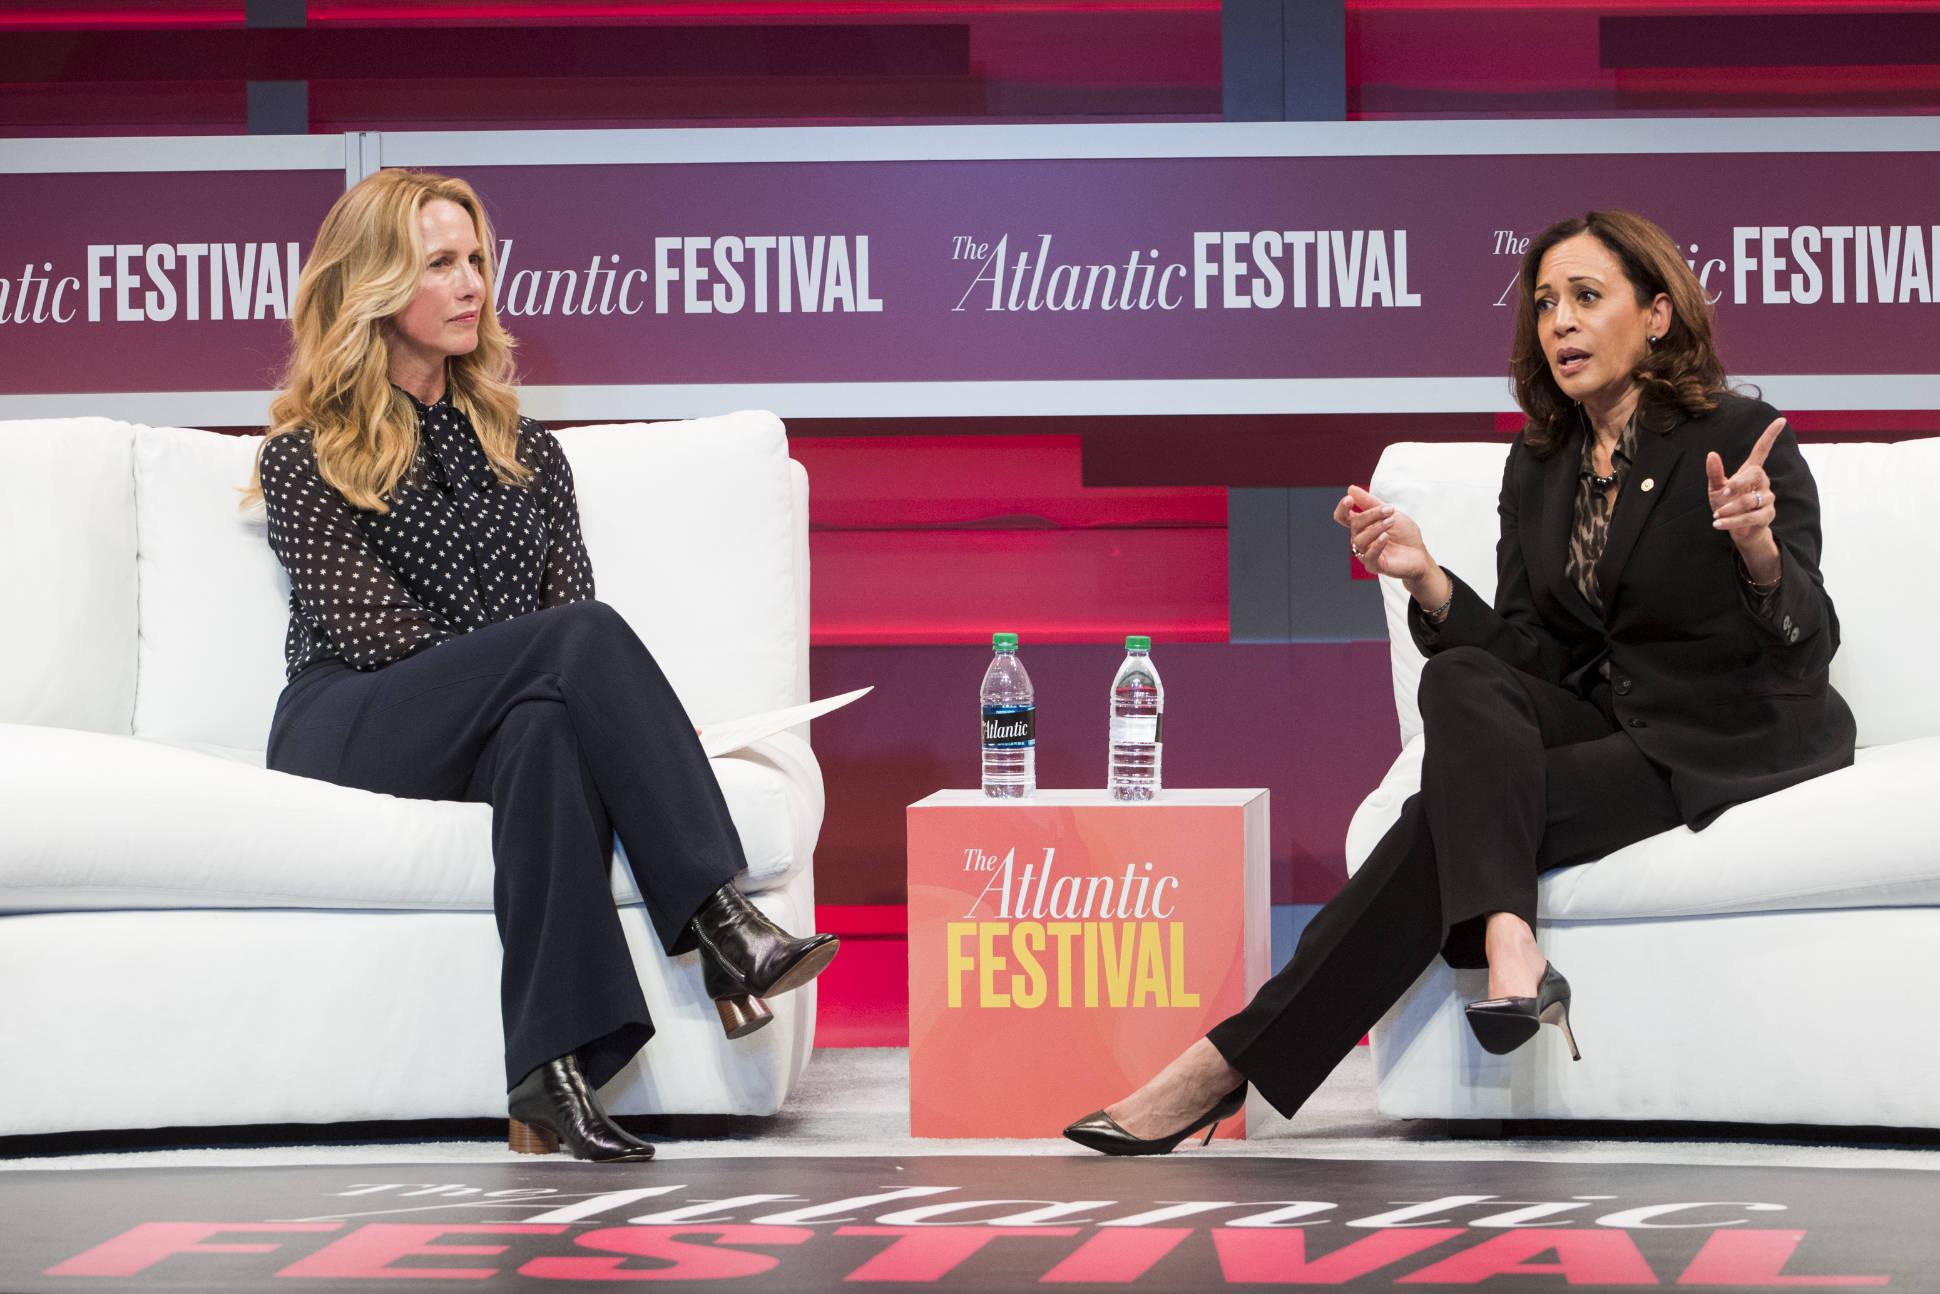 Laurene Powell Jobs and Kamala Harris at The Atlantic Festival